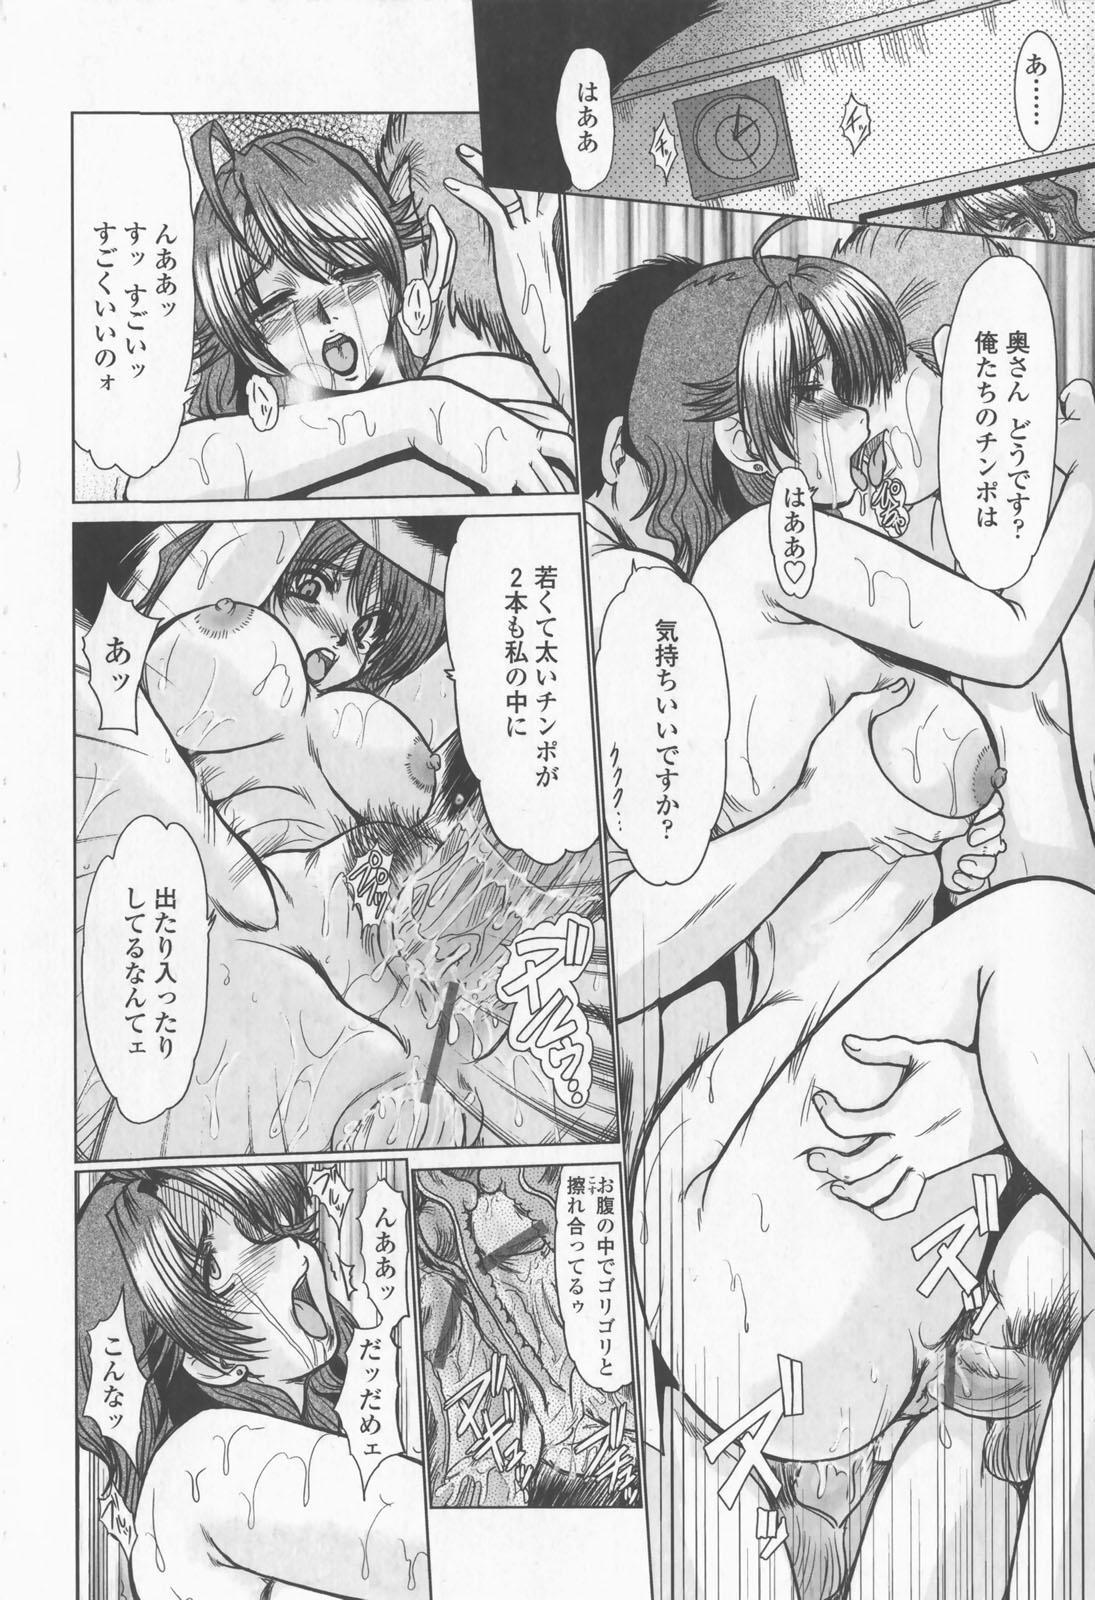 Inran Okusama Gari - Lewd Wife Hunting 43